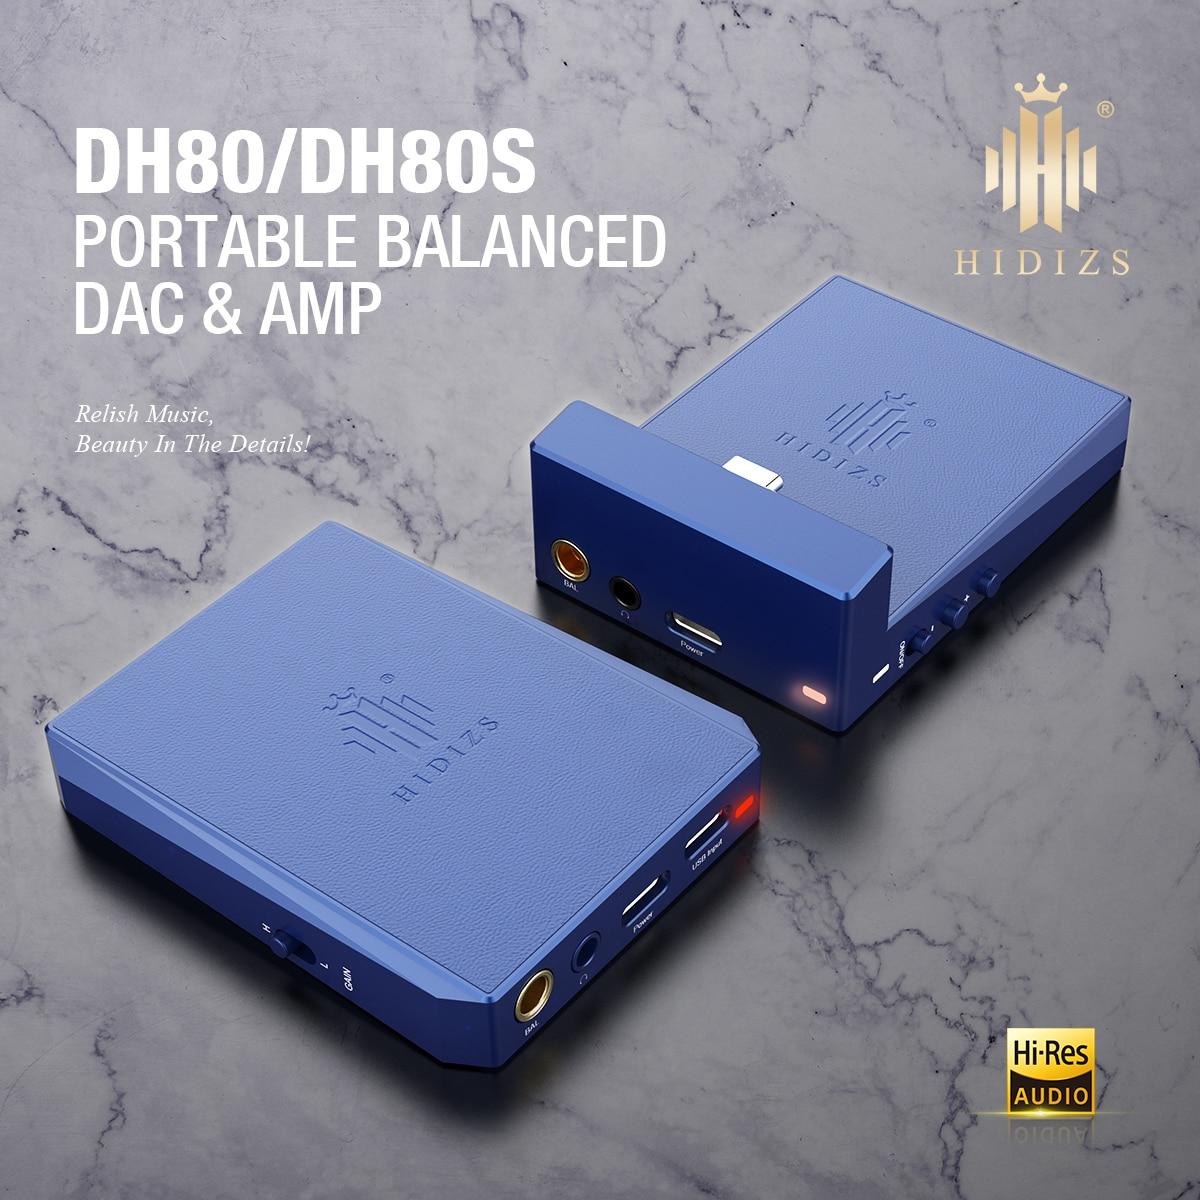 Hidizs DH80/DH80S USB DAC/أمبير محمول متوازن مع MQA دعم سبائك الألومنيوم نك شل 3 مستوى كسب اختيار للهاتف/Dap